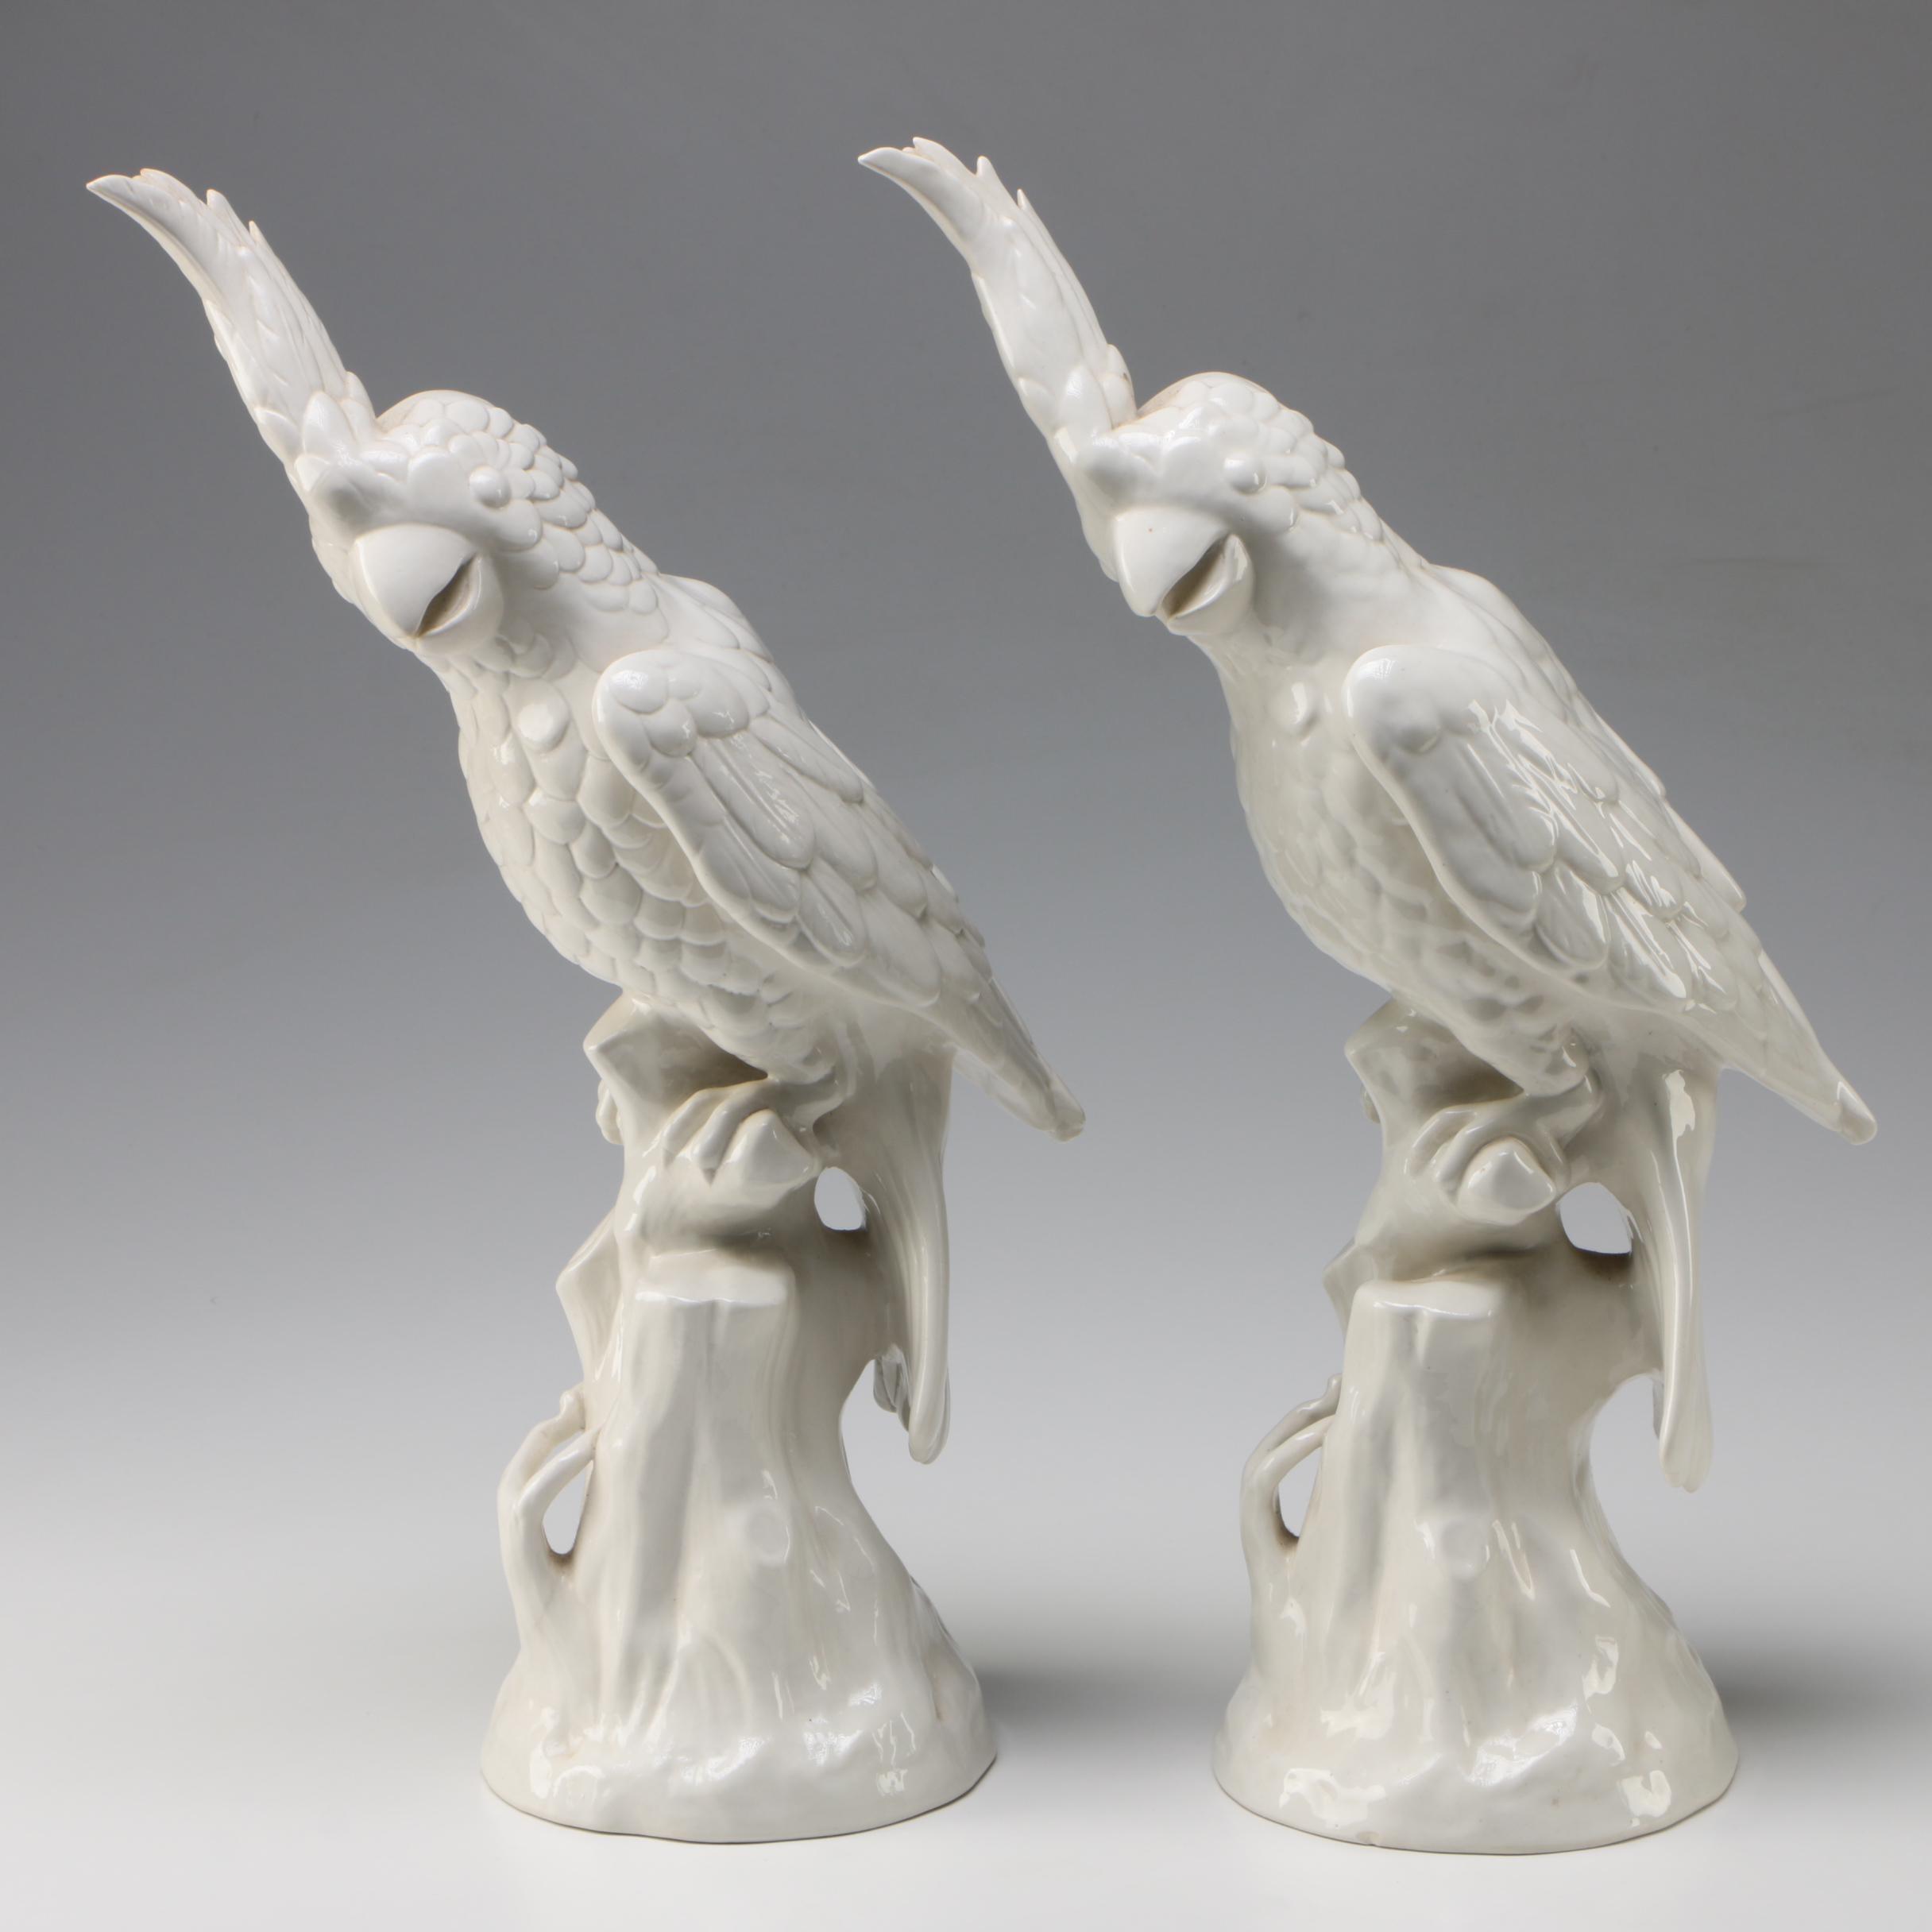 Pair of Mottahedeh Italian Ceramic Parrot Statuettes, Late 20th Century